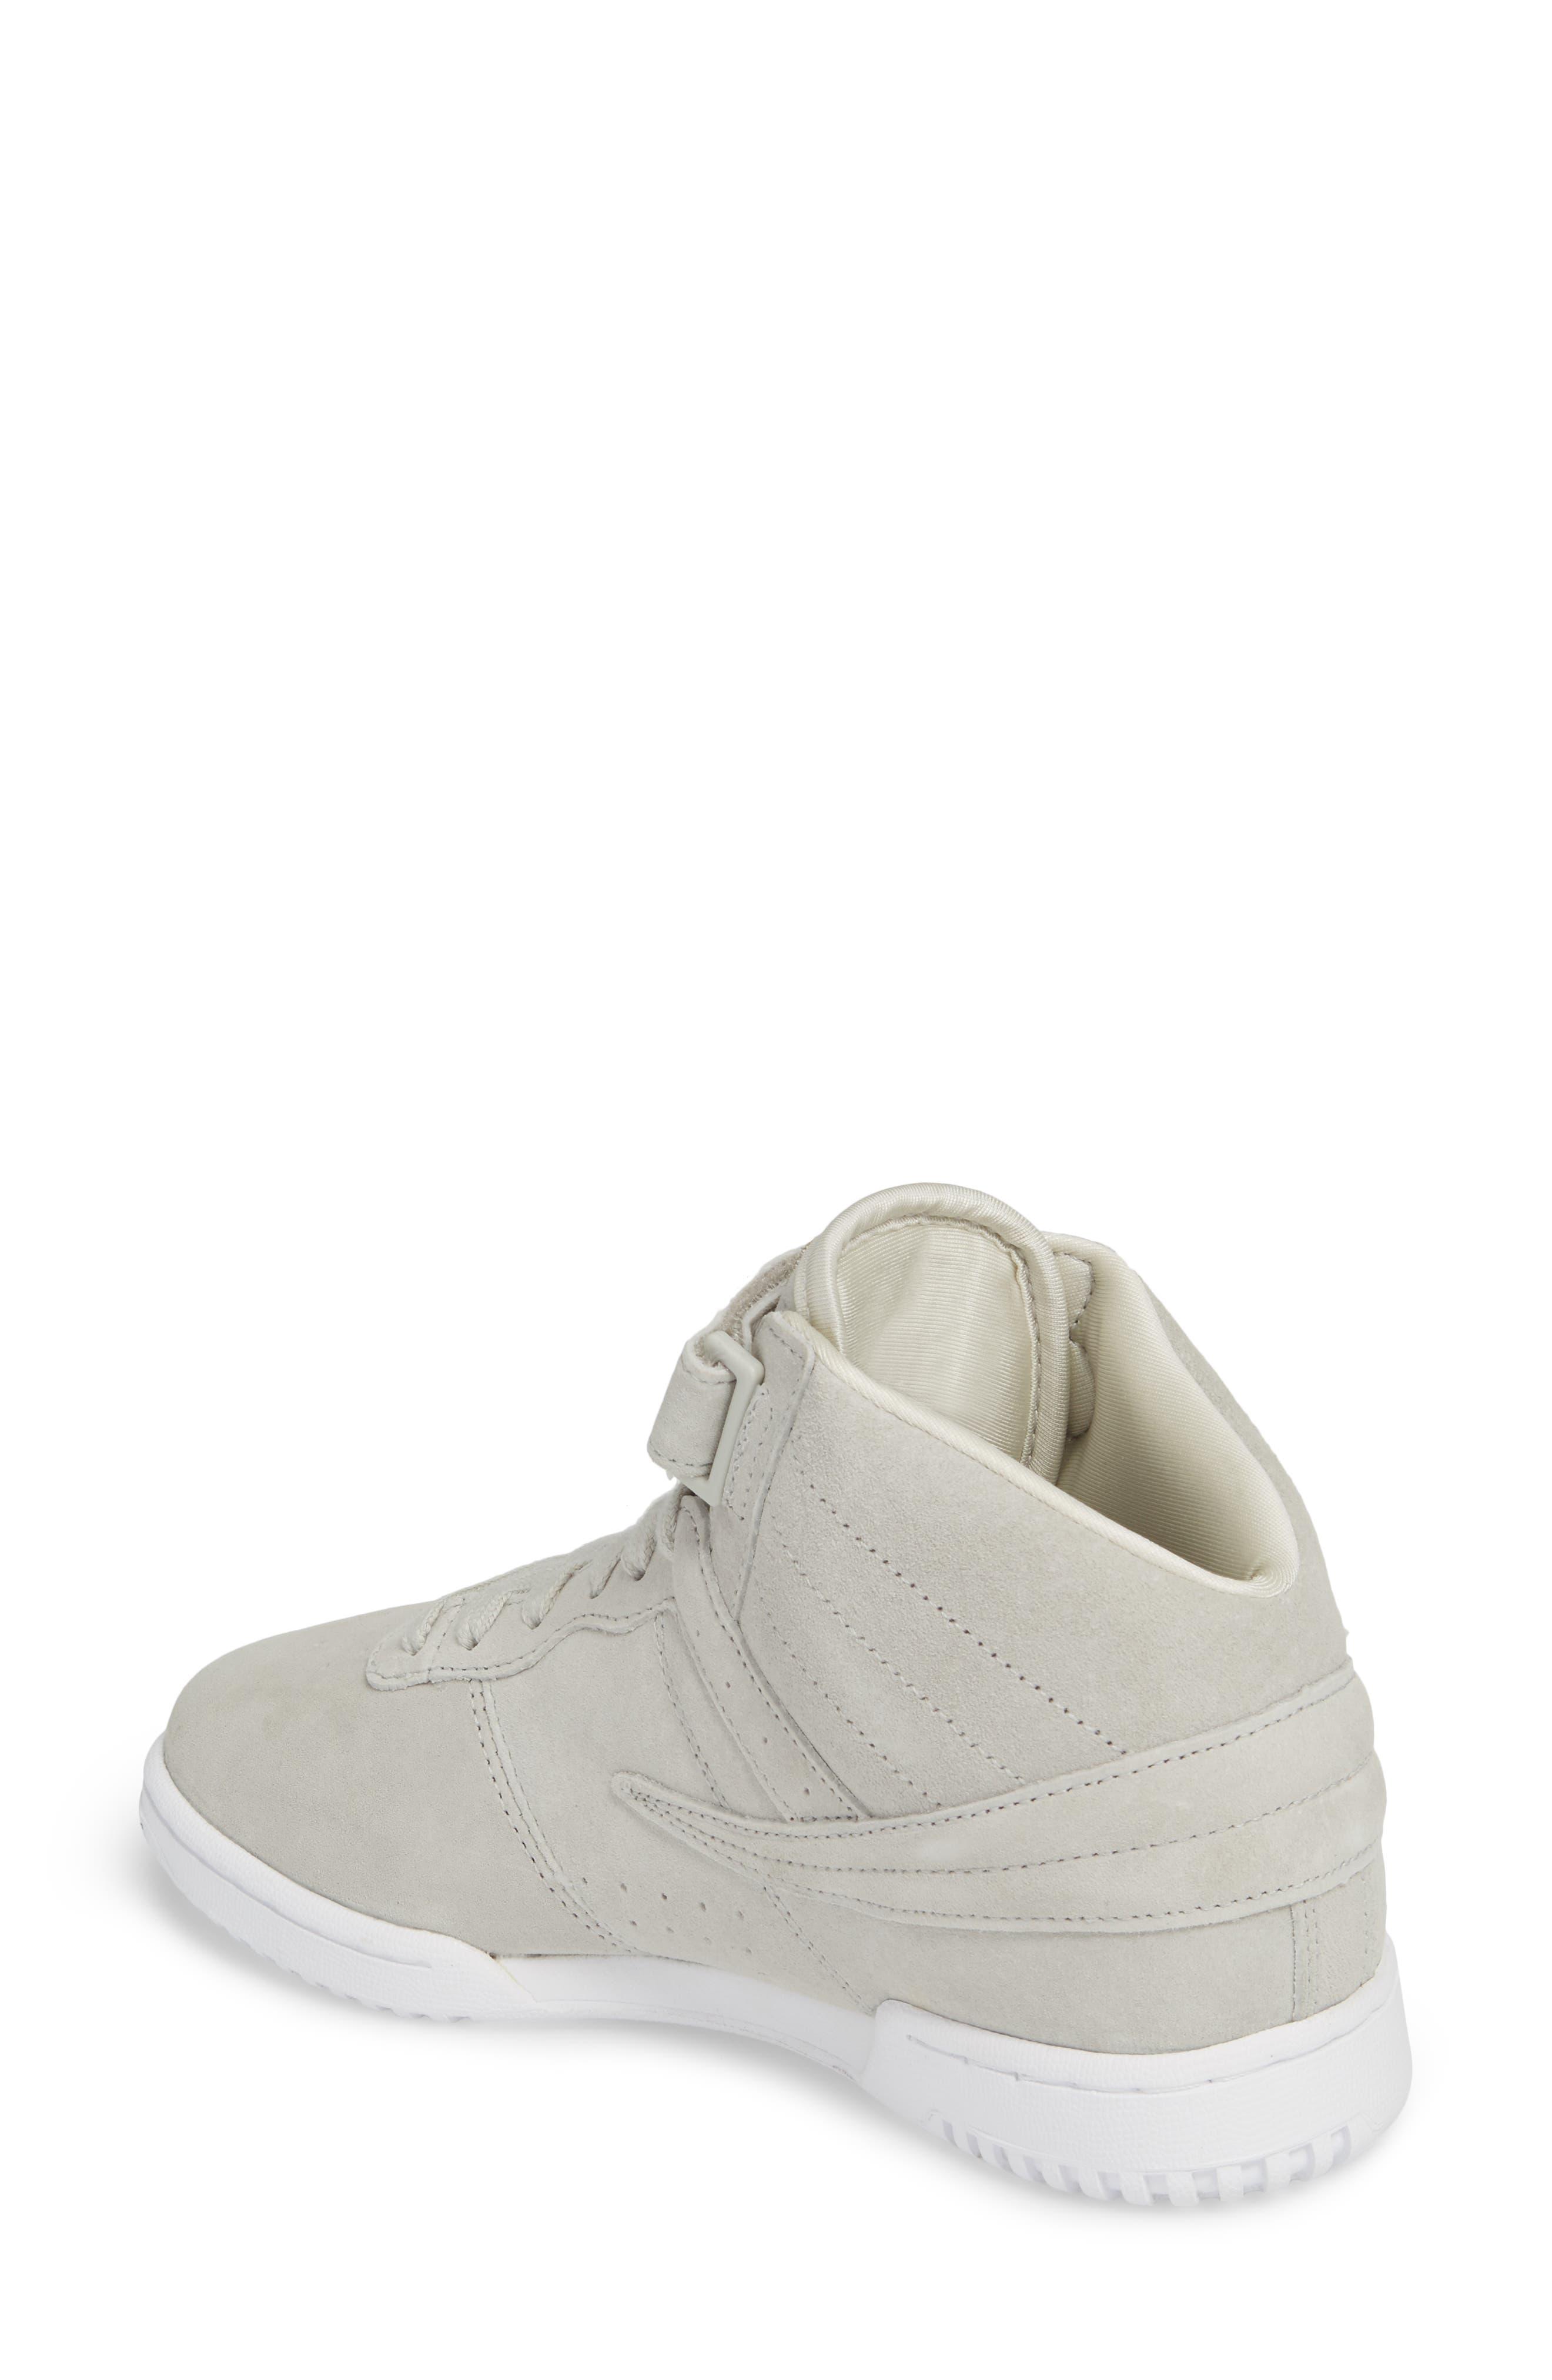 F-13 Premium Mid Top Sneaker,                             Alternate thumbnail 2, color,                             White